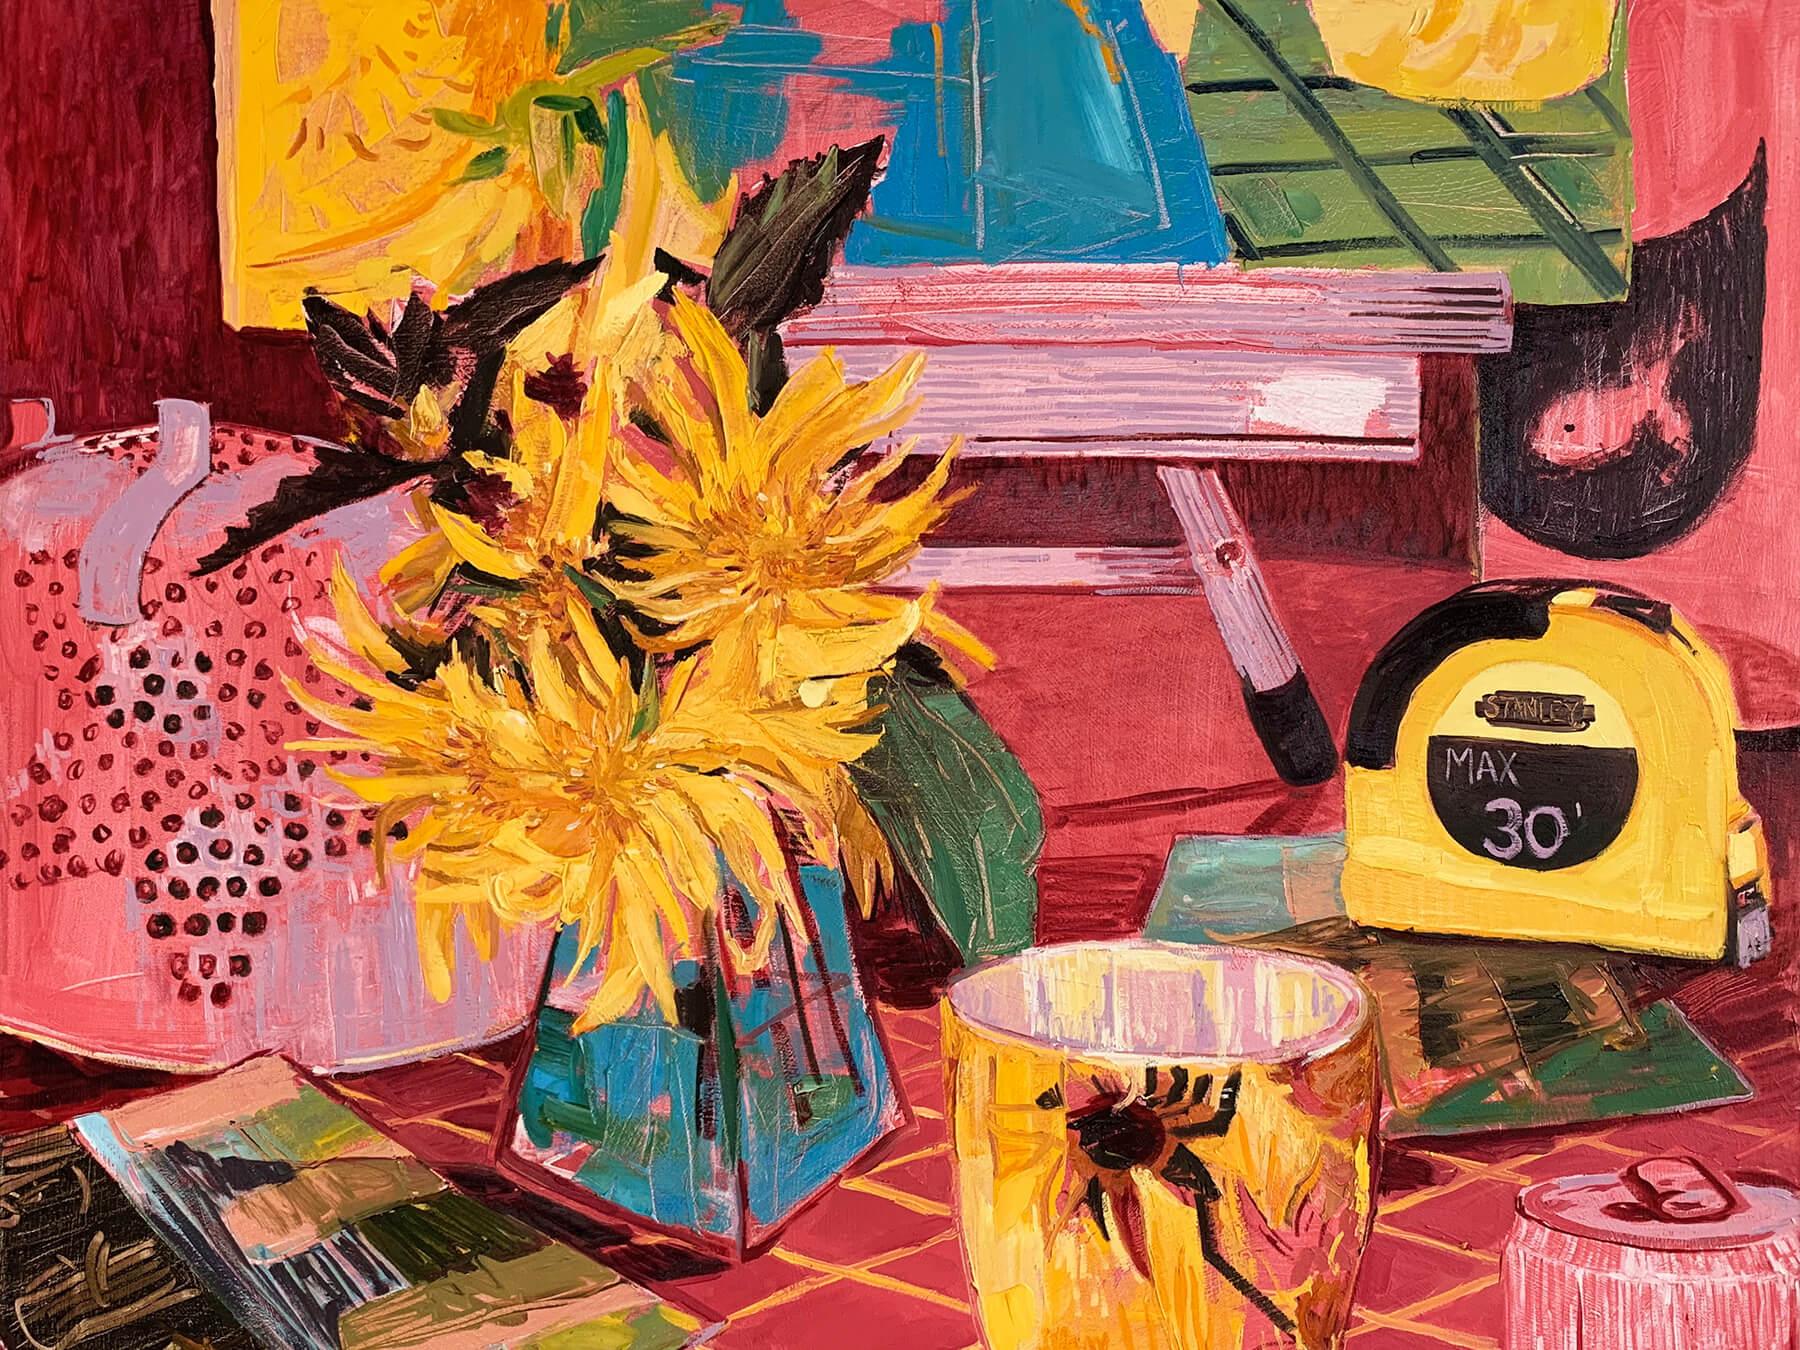 """Red Studio Still Life"" 2019, oil on canvas, 30"" x 36"""